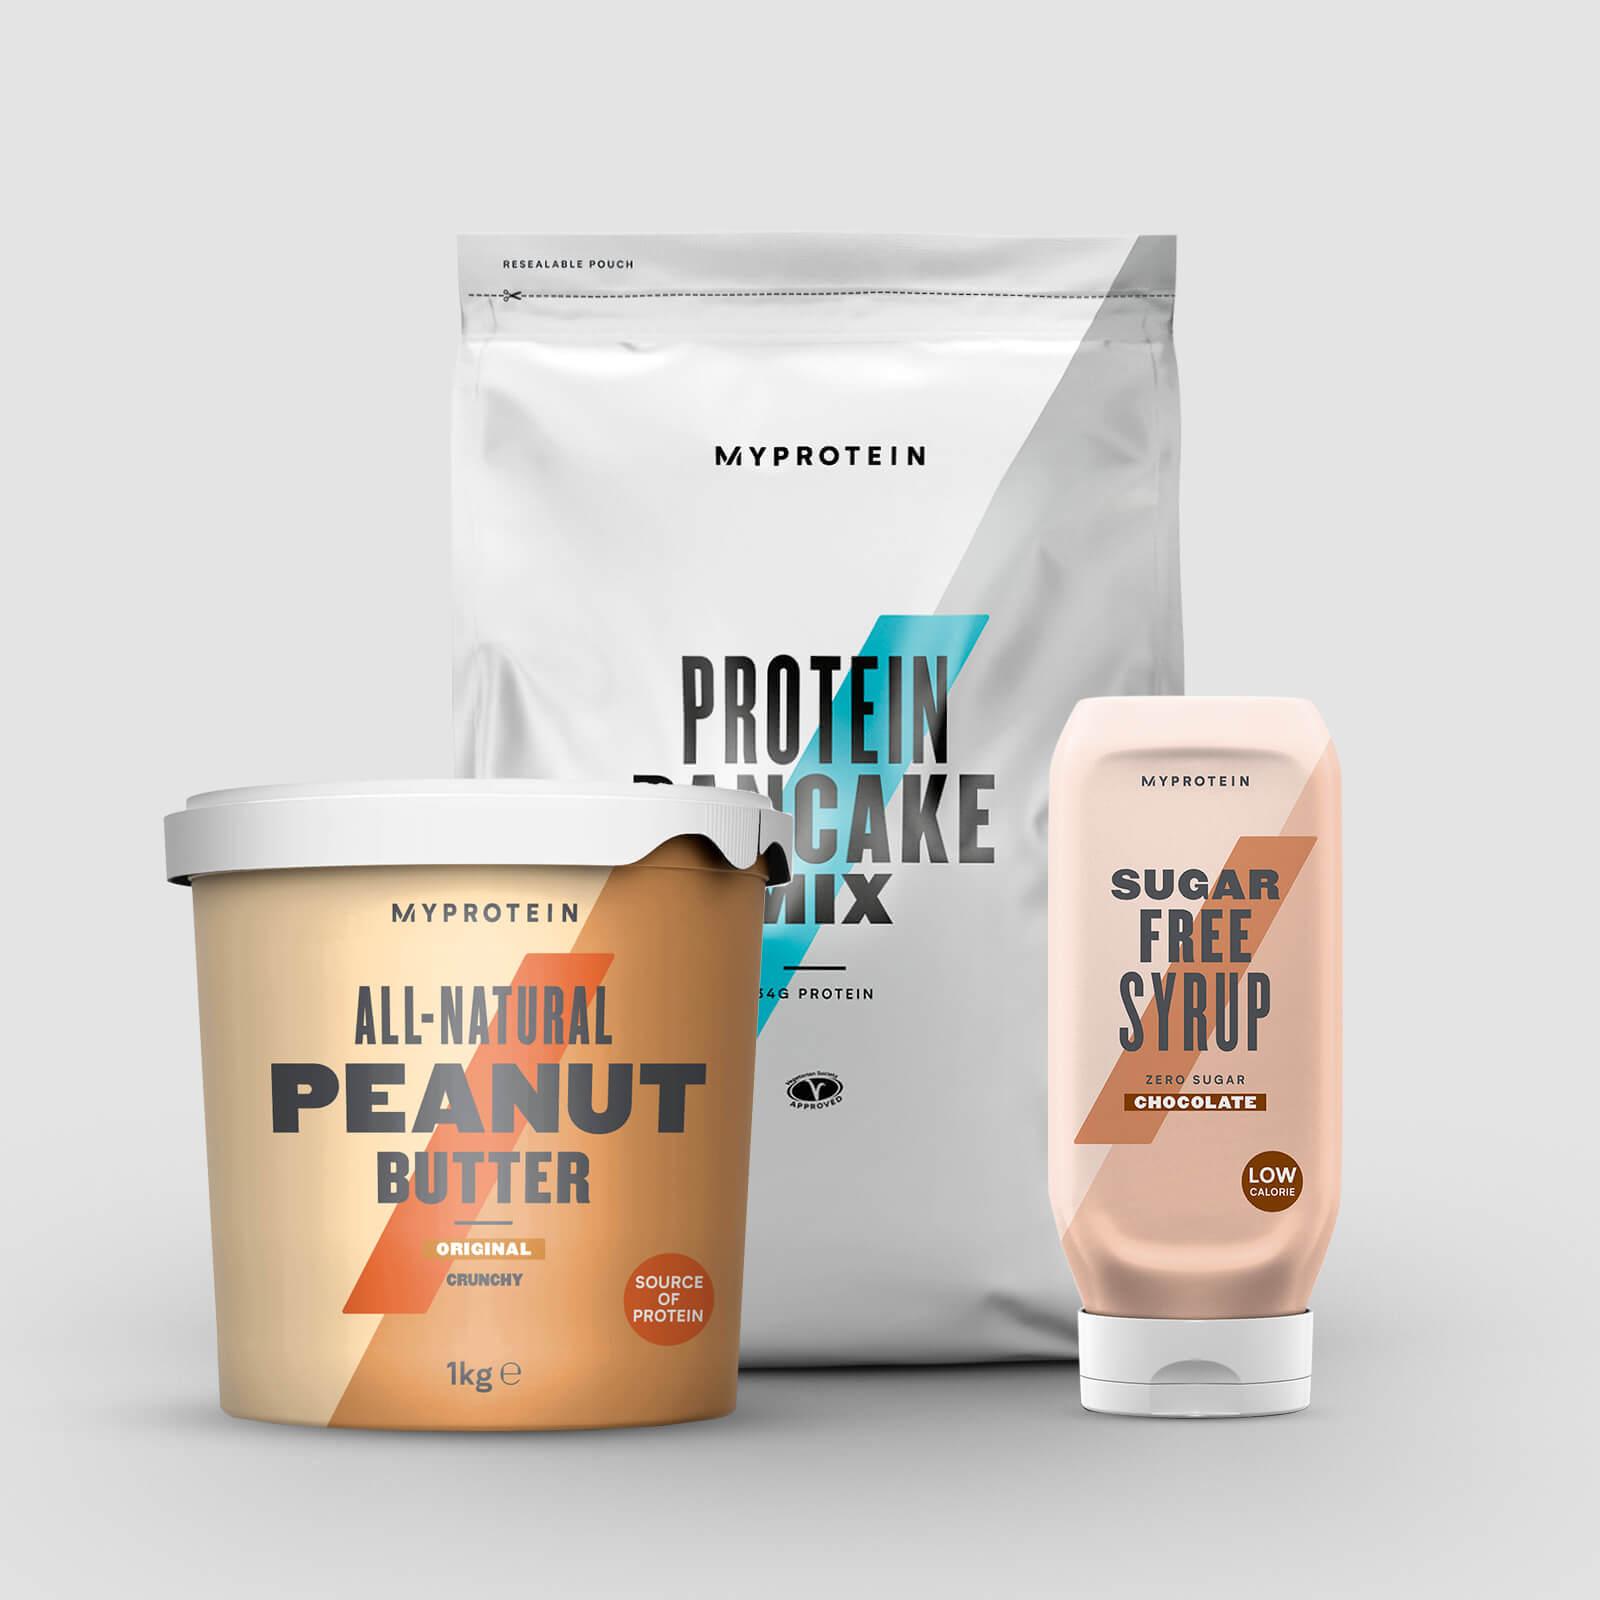 Myprotein Pancake Bundle - Pancake Mix - Maple Syrup - Syrup - Blueberry